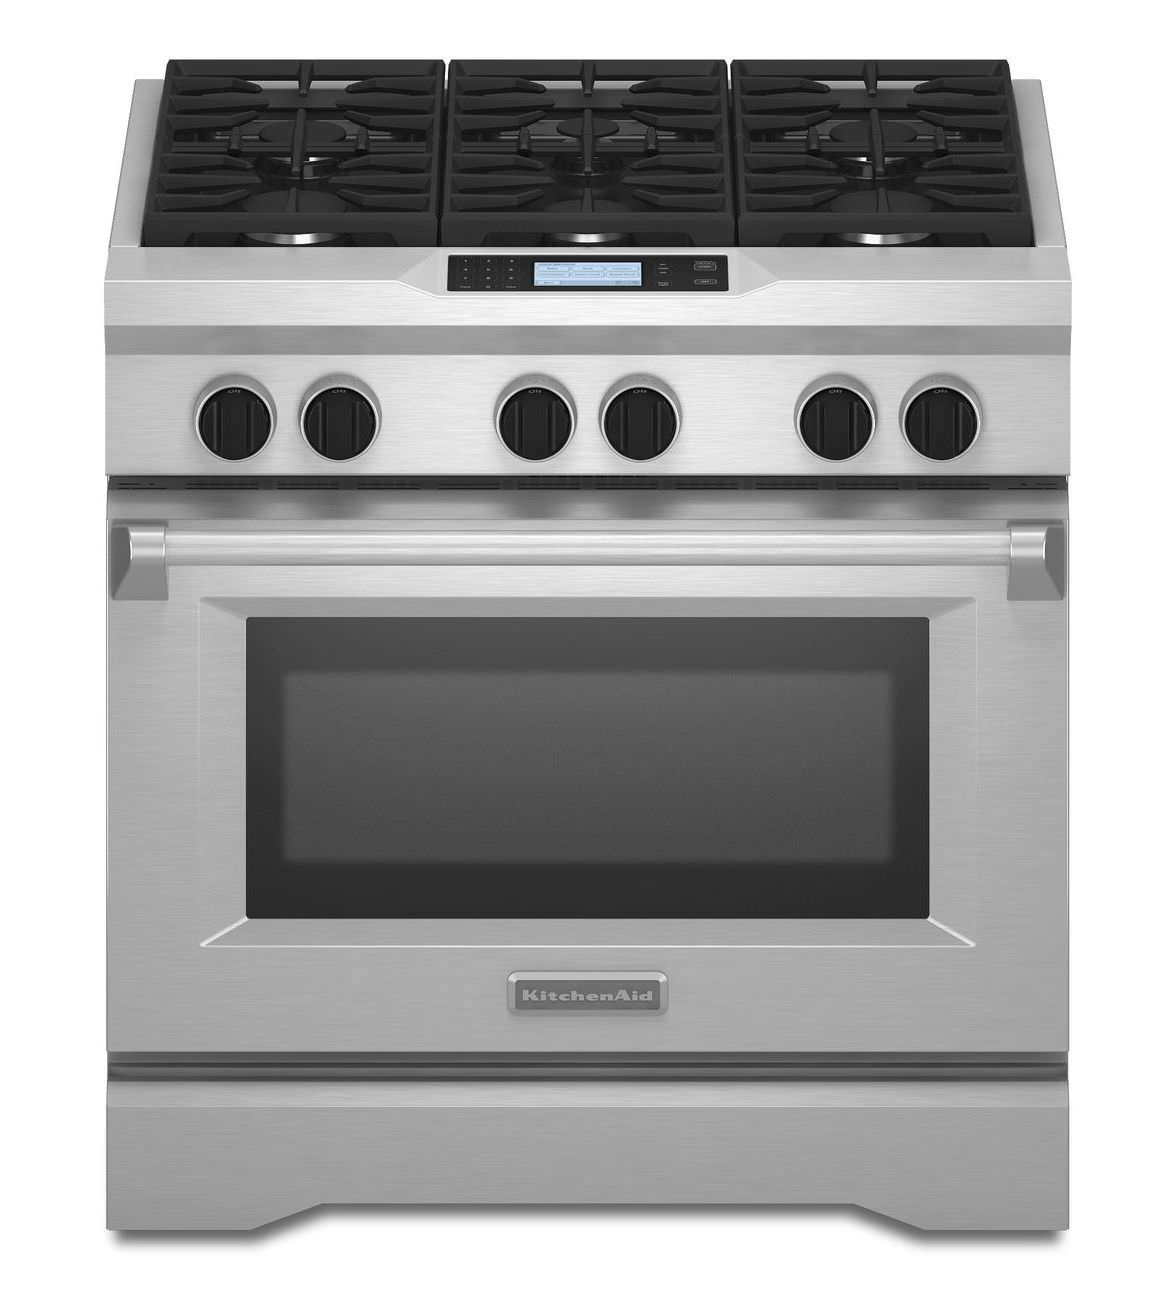 Blocco cucina a gas - KDRU767VSS - KitchenAid